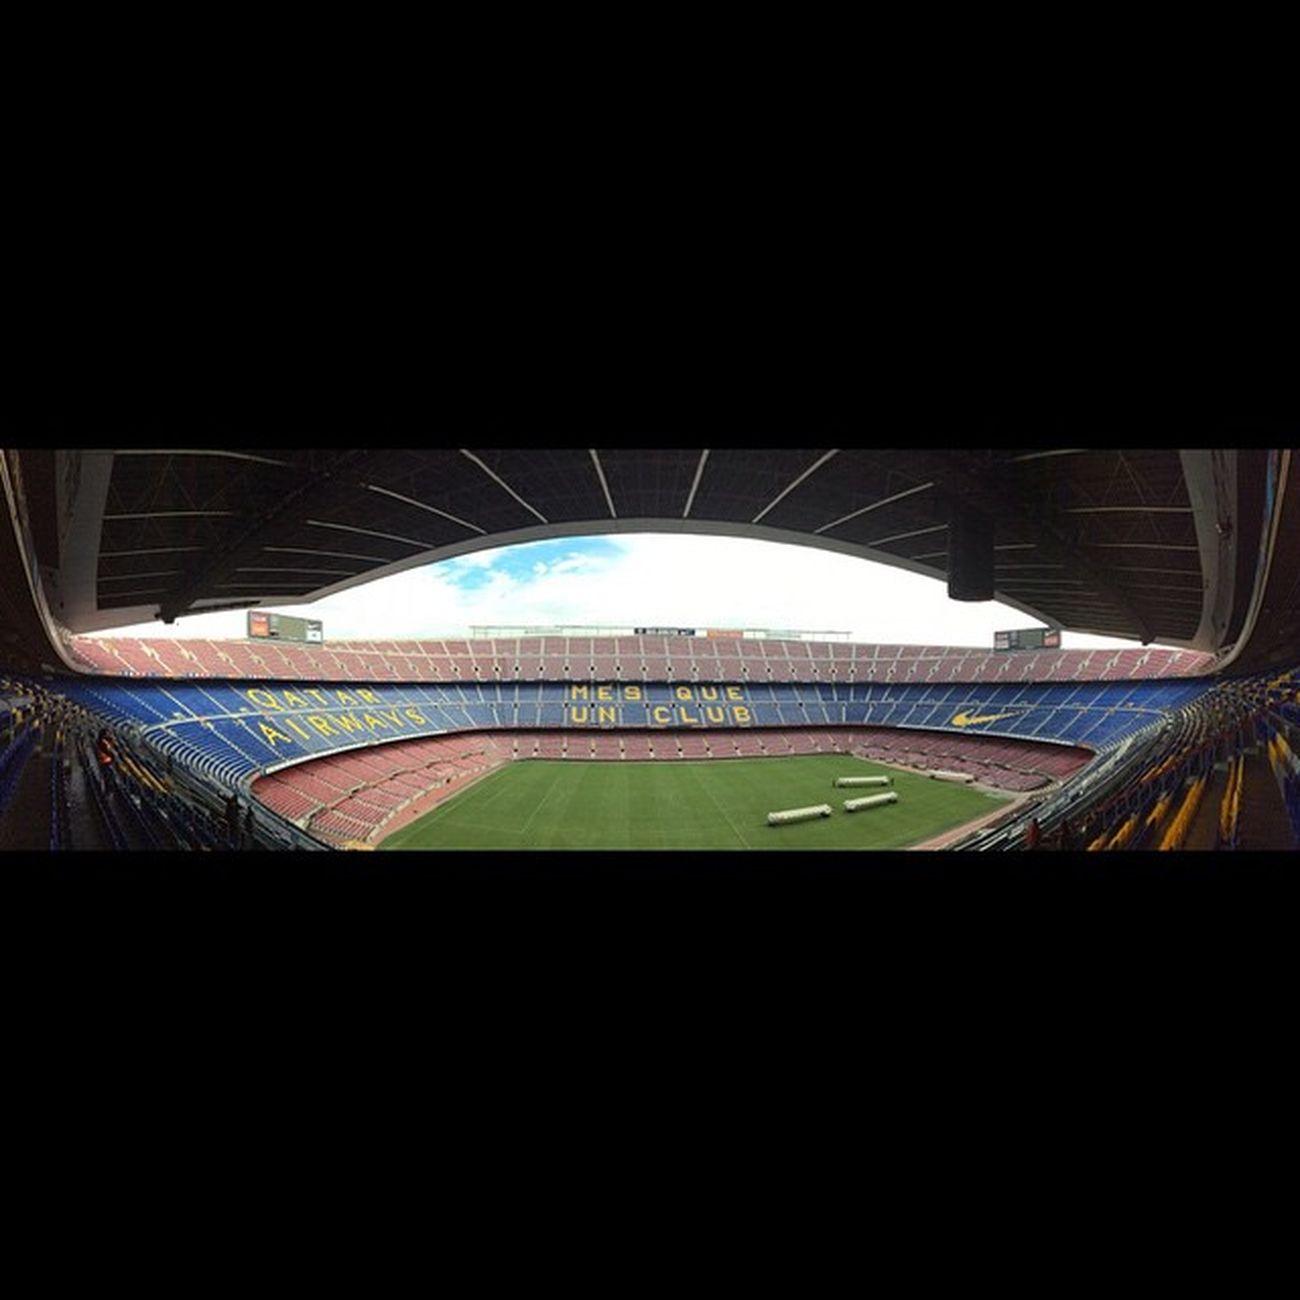 Campnou Mesqueunclub Noucamp Morethanaclub barcelona fcbarcelona fcb panoramic view stadium cataluna catalunya spain espana espanya qatarairways nike nofilter amazing fantastic iwasthere trip travel